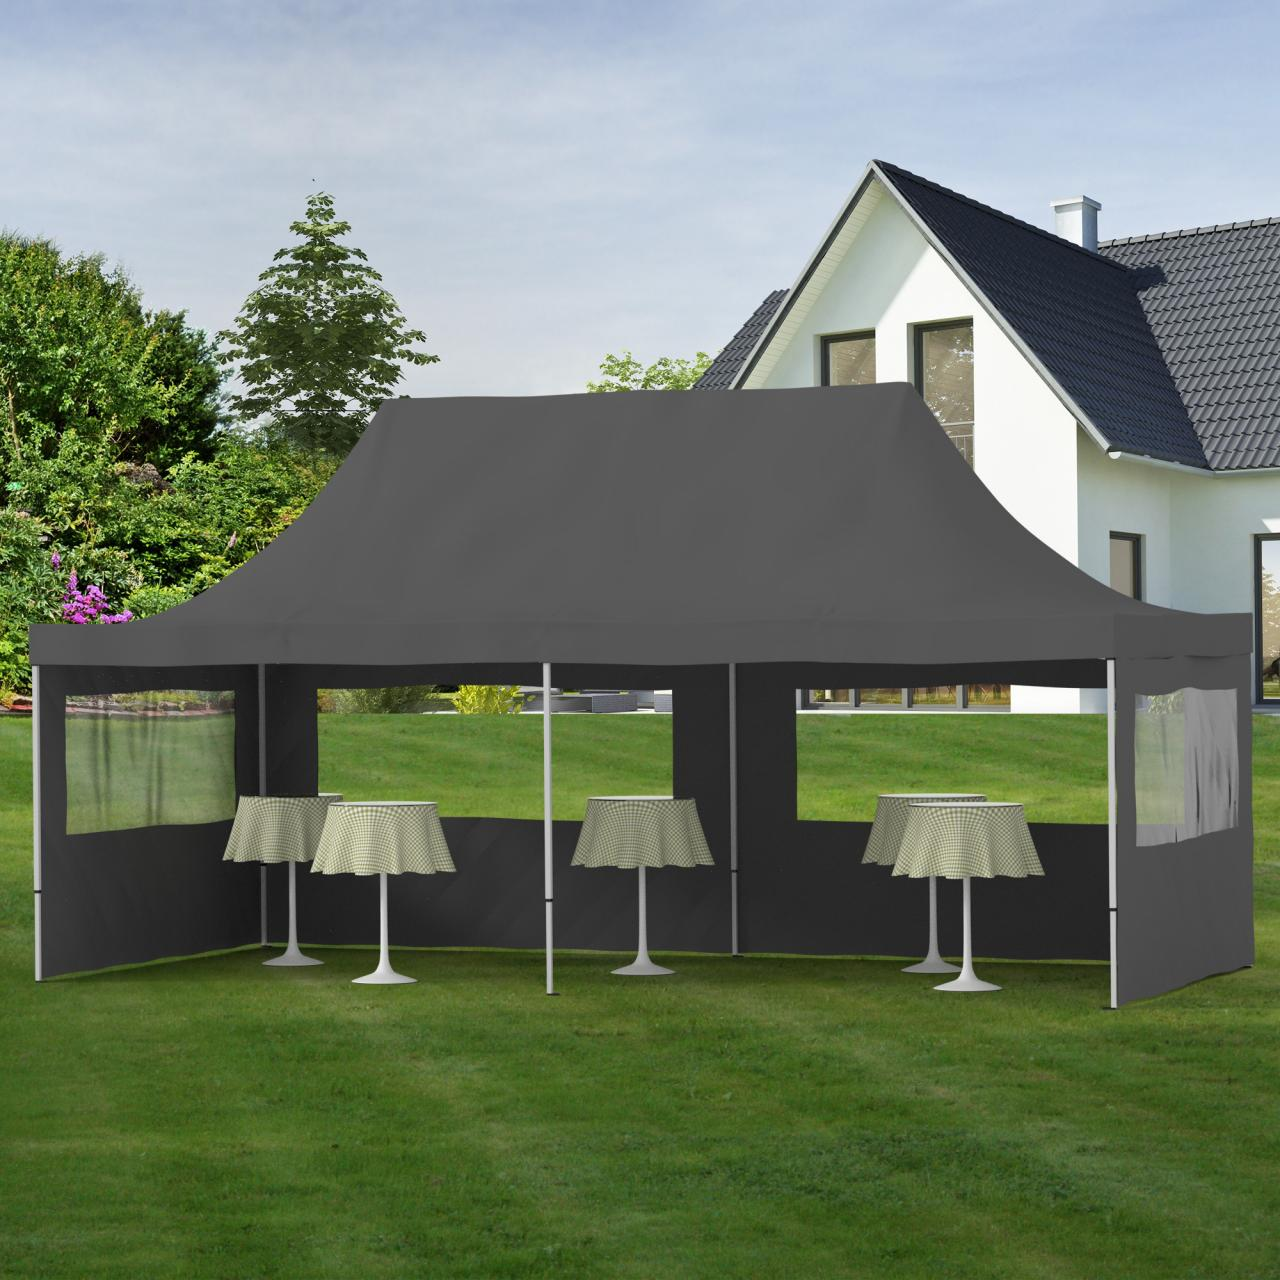 Gartenpavillon Zelt Faltpavillon Pavillon Partyzelt 3x6 : Gartenpavillon alu faltzelt faltpavillon klappzelt